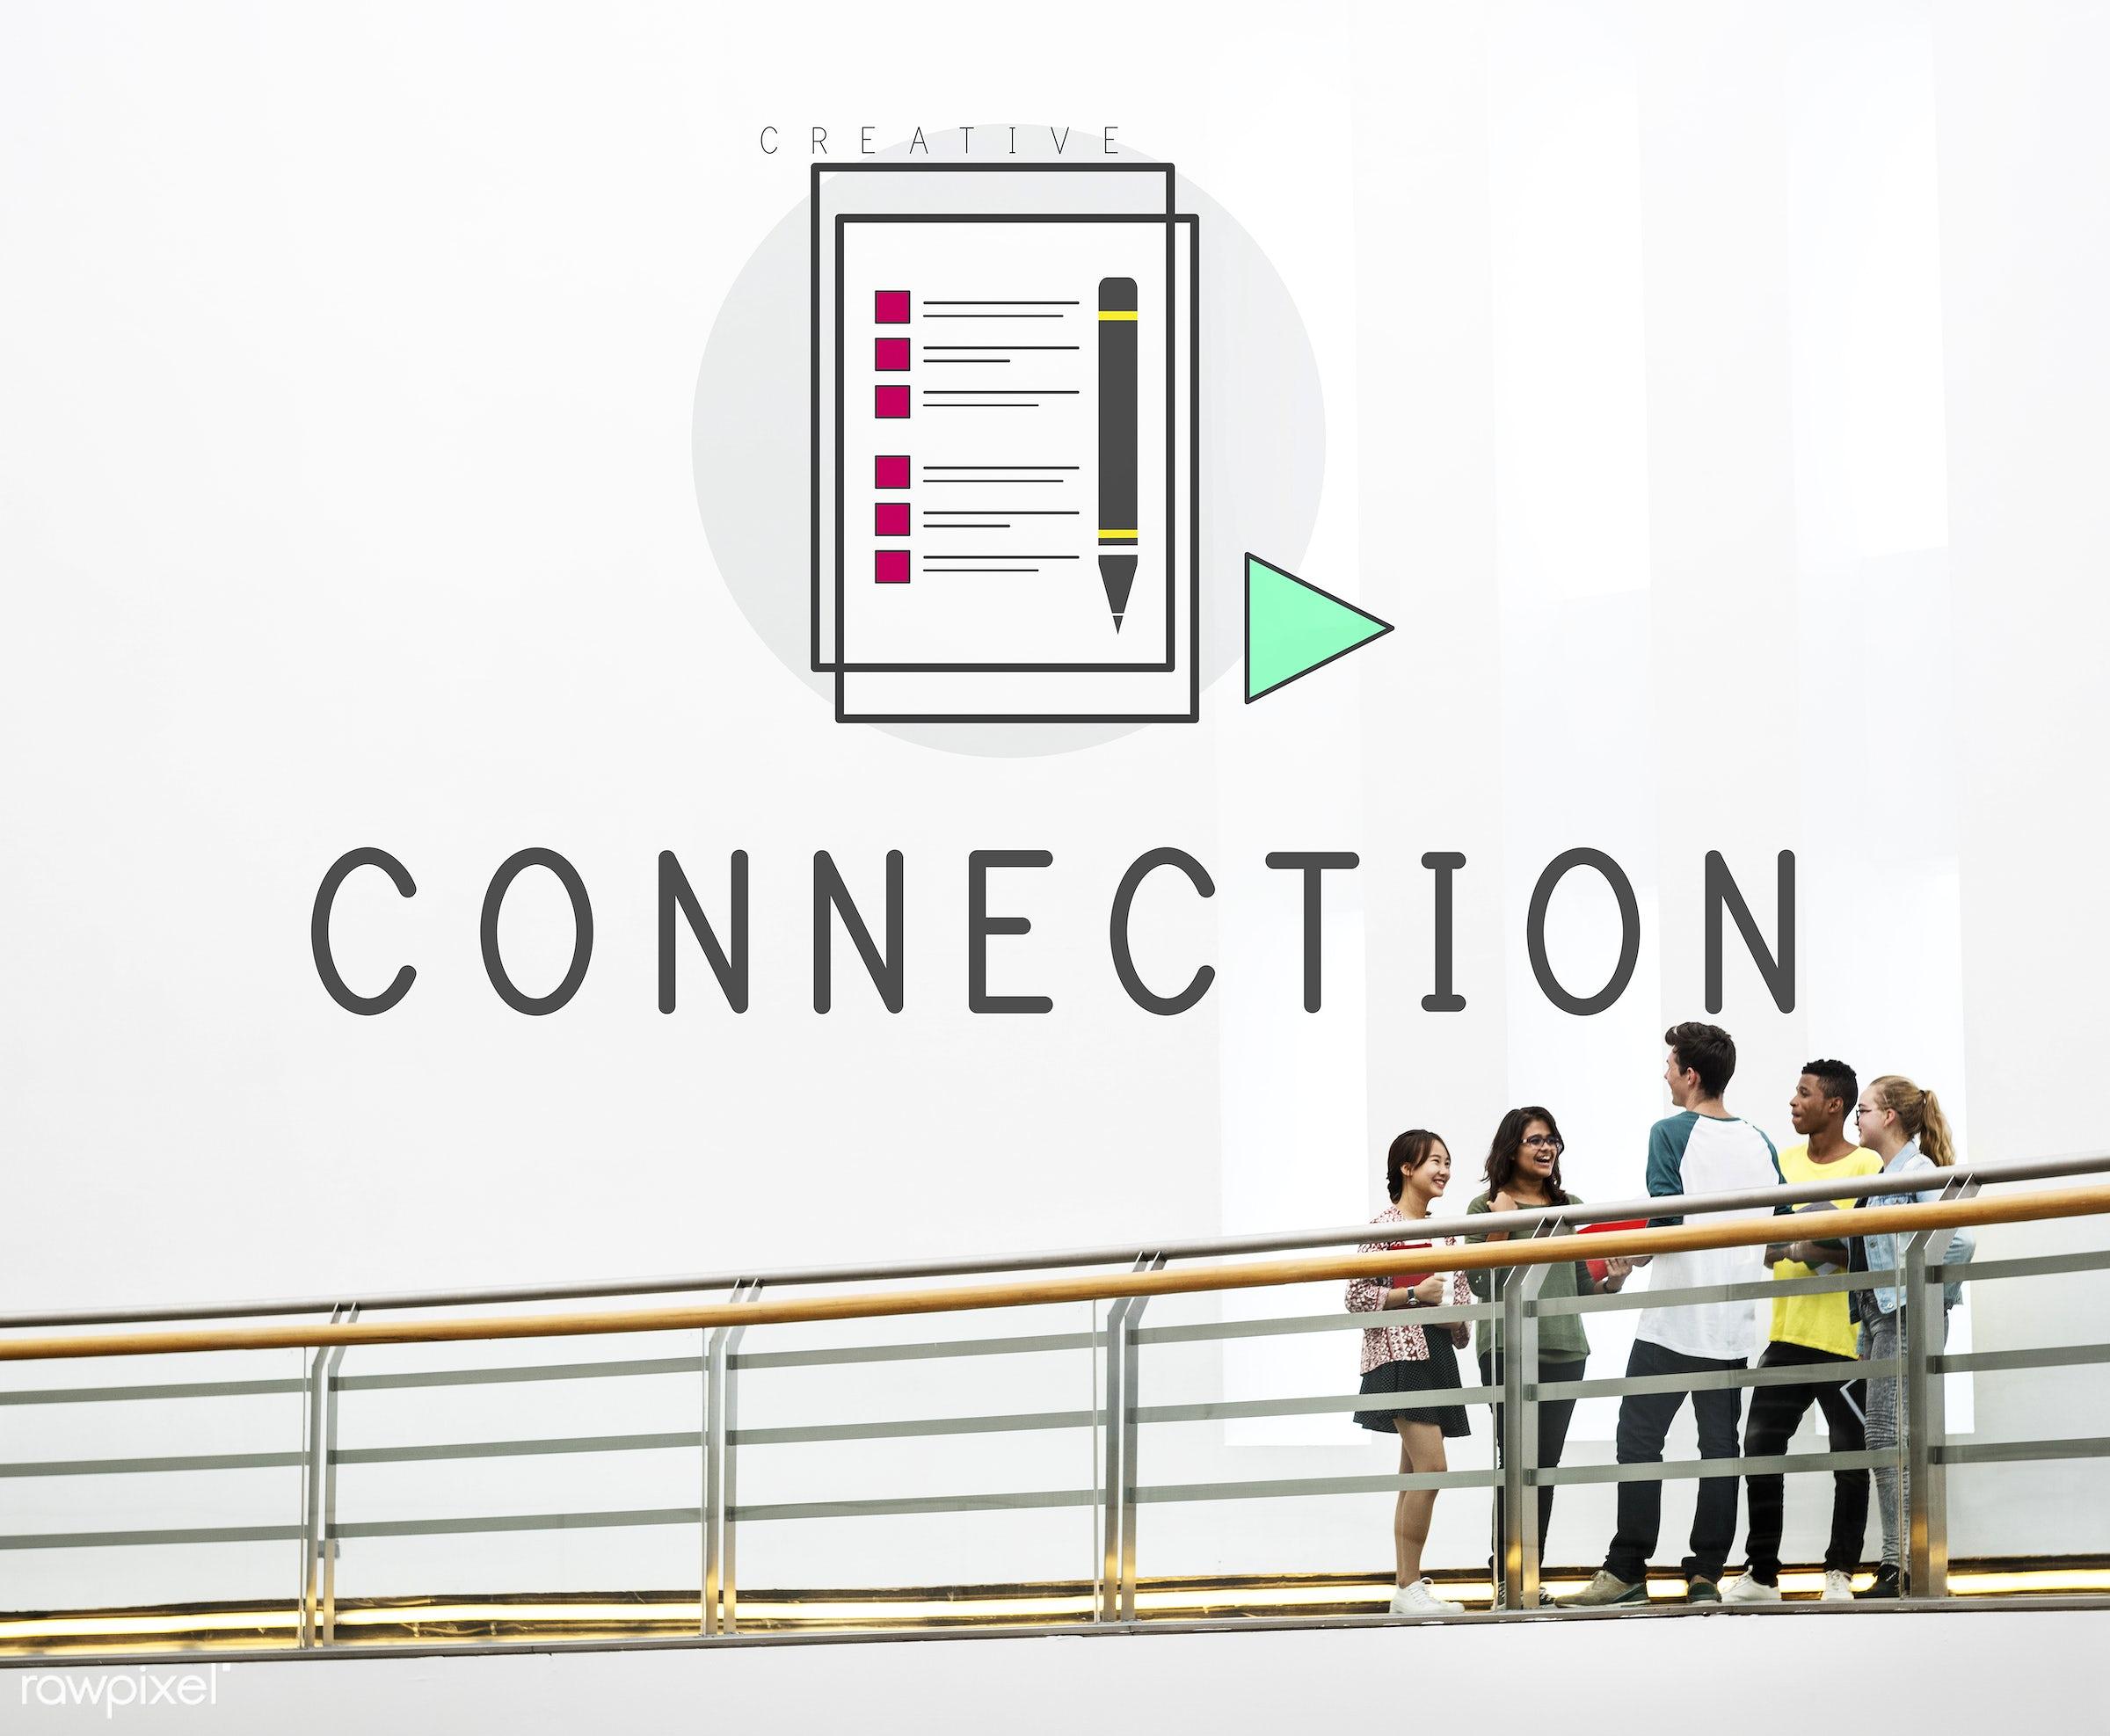 carrying, author, blog, blogging, book, books, boy, bridge, communication, community, connection, creative, data, digital,...